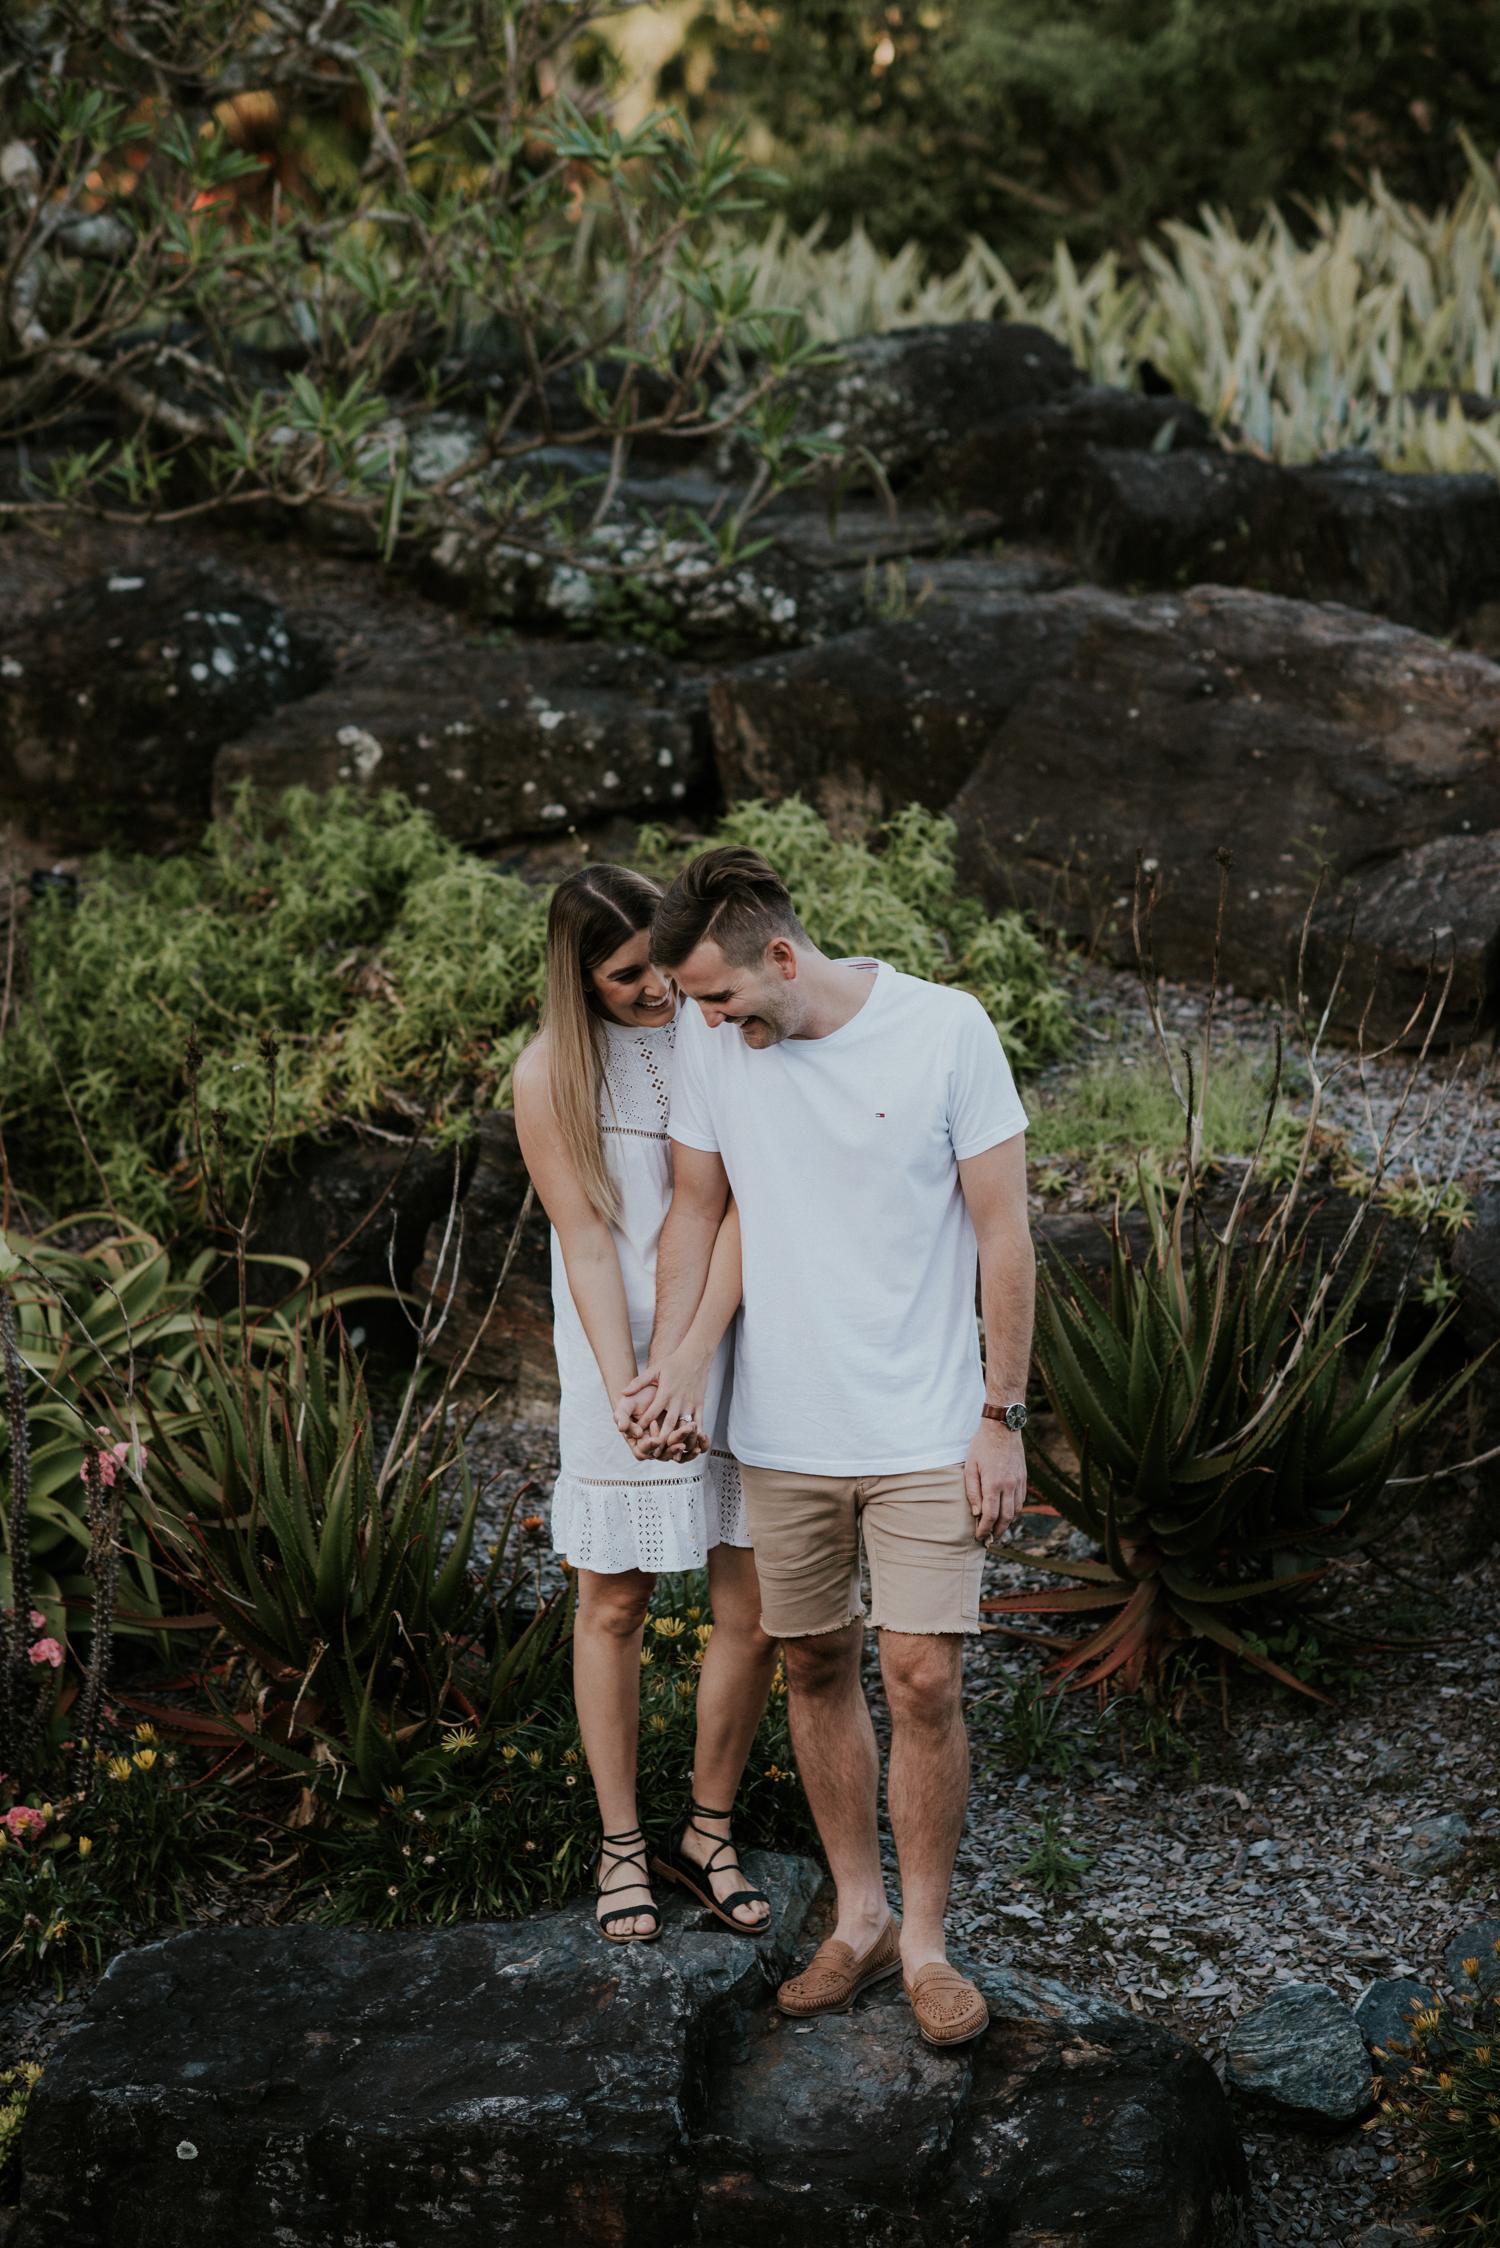 Brisbane Wedding Photographer | Engagement-Elopement Photography Botanical Gardens-19.jpg